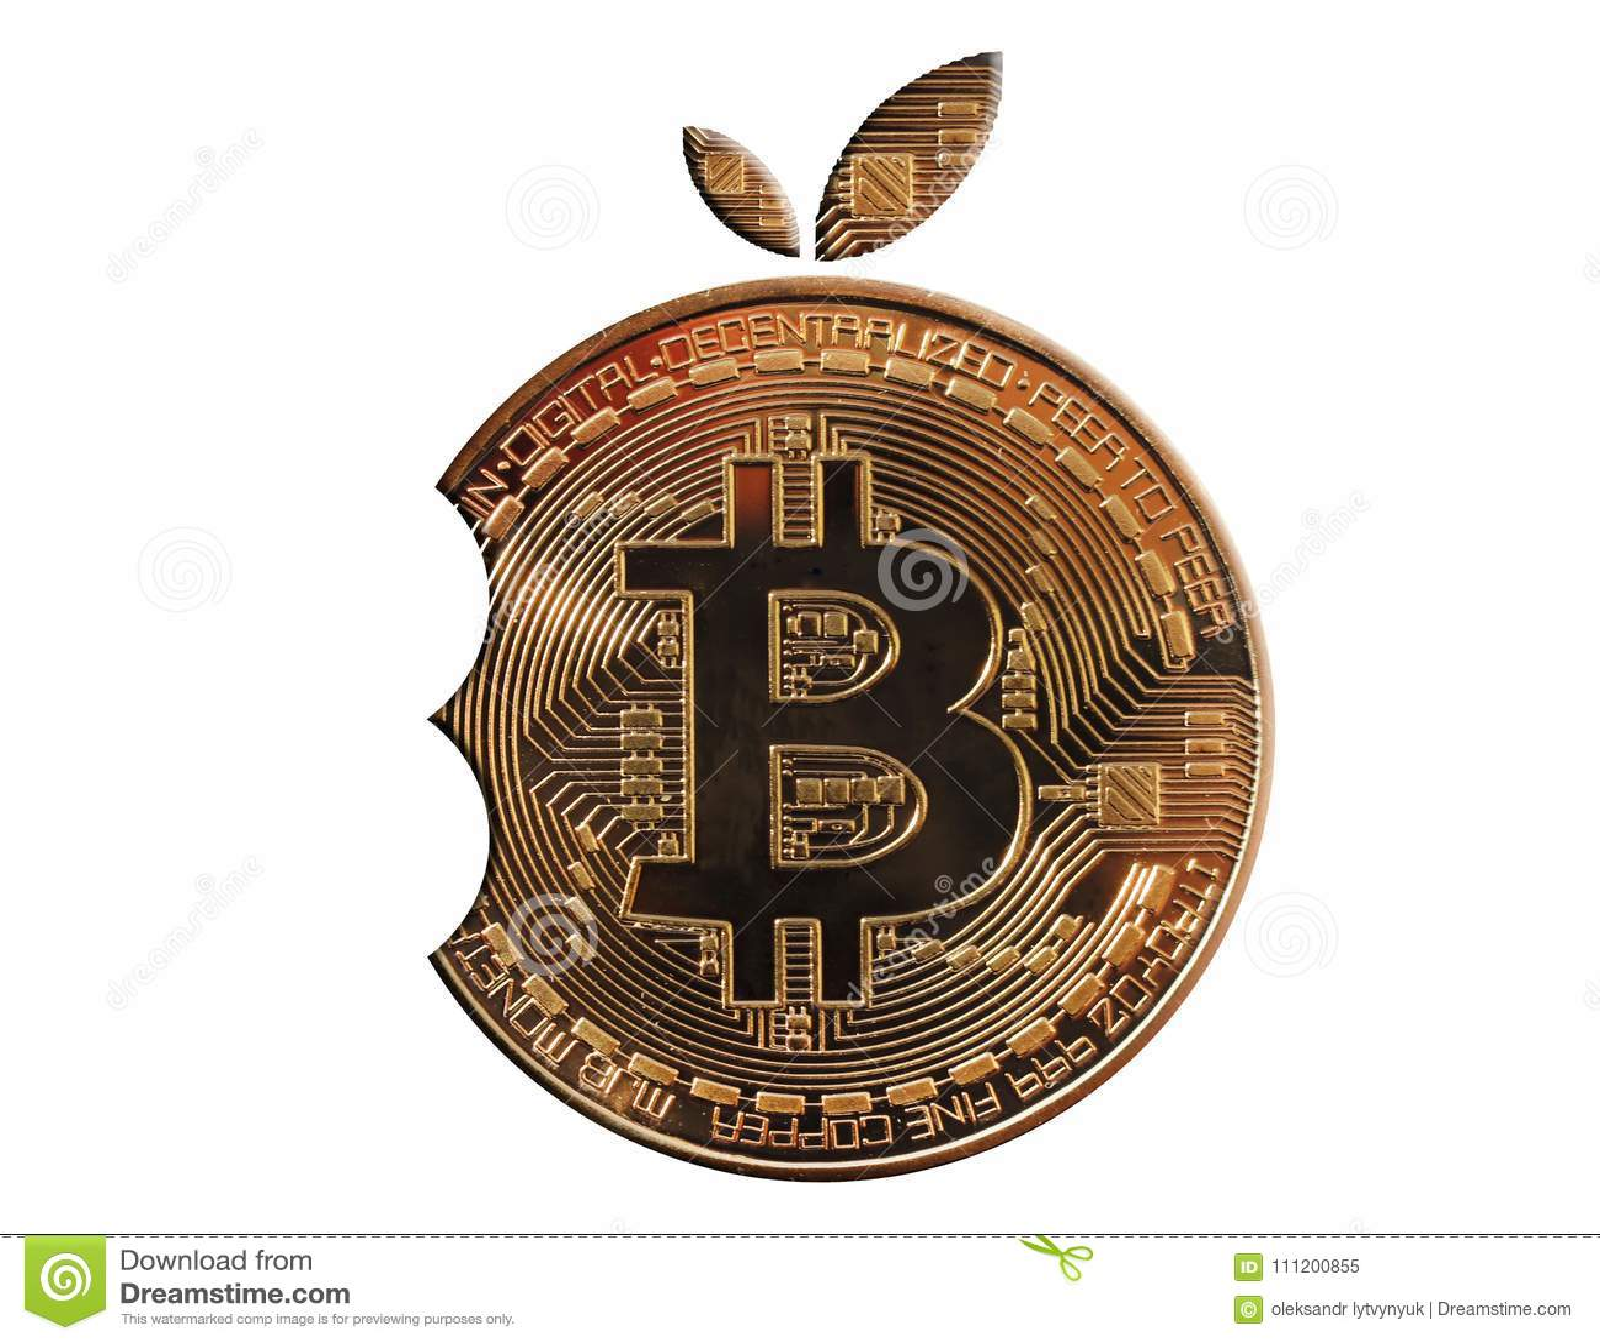 btc automat deep web bitcoin gratuit